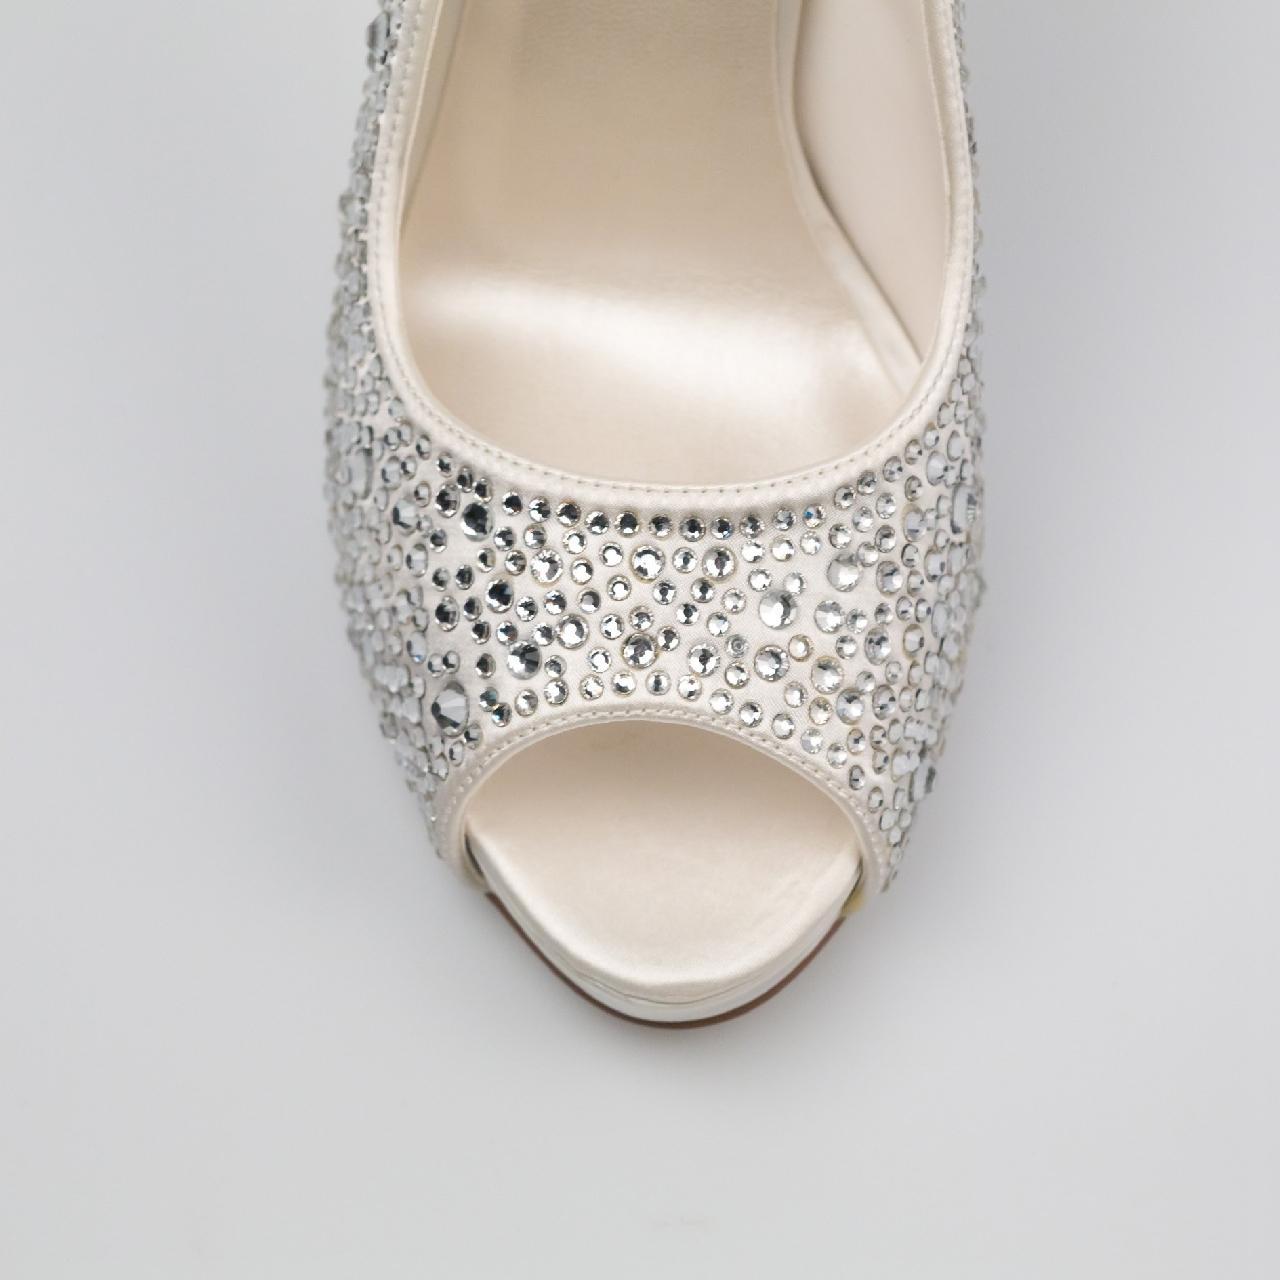 Svadobné topánky Roxanne - Obrázok č. 3